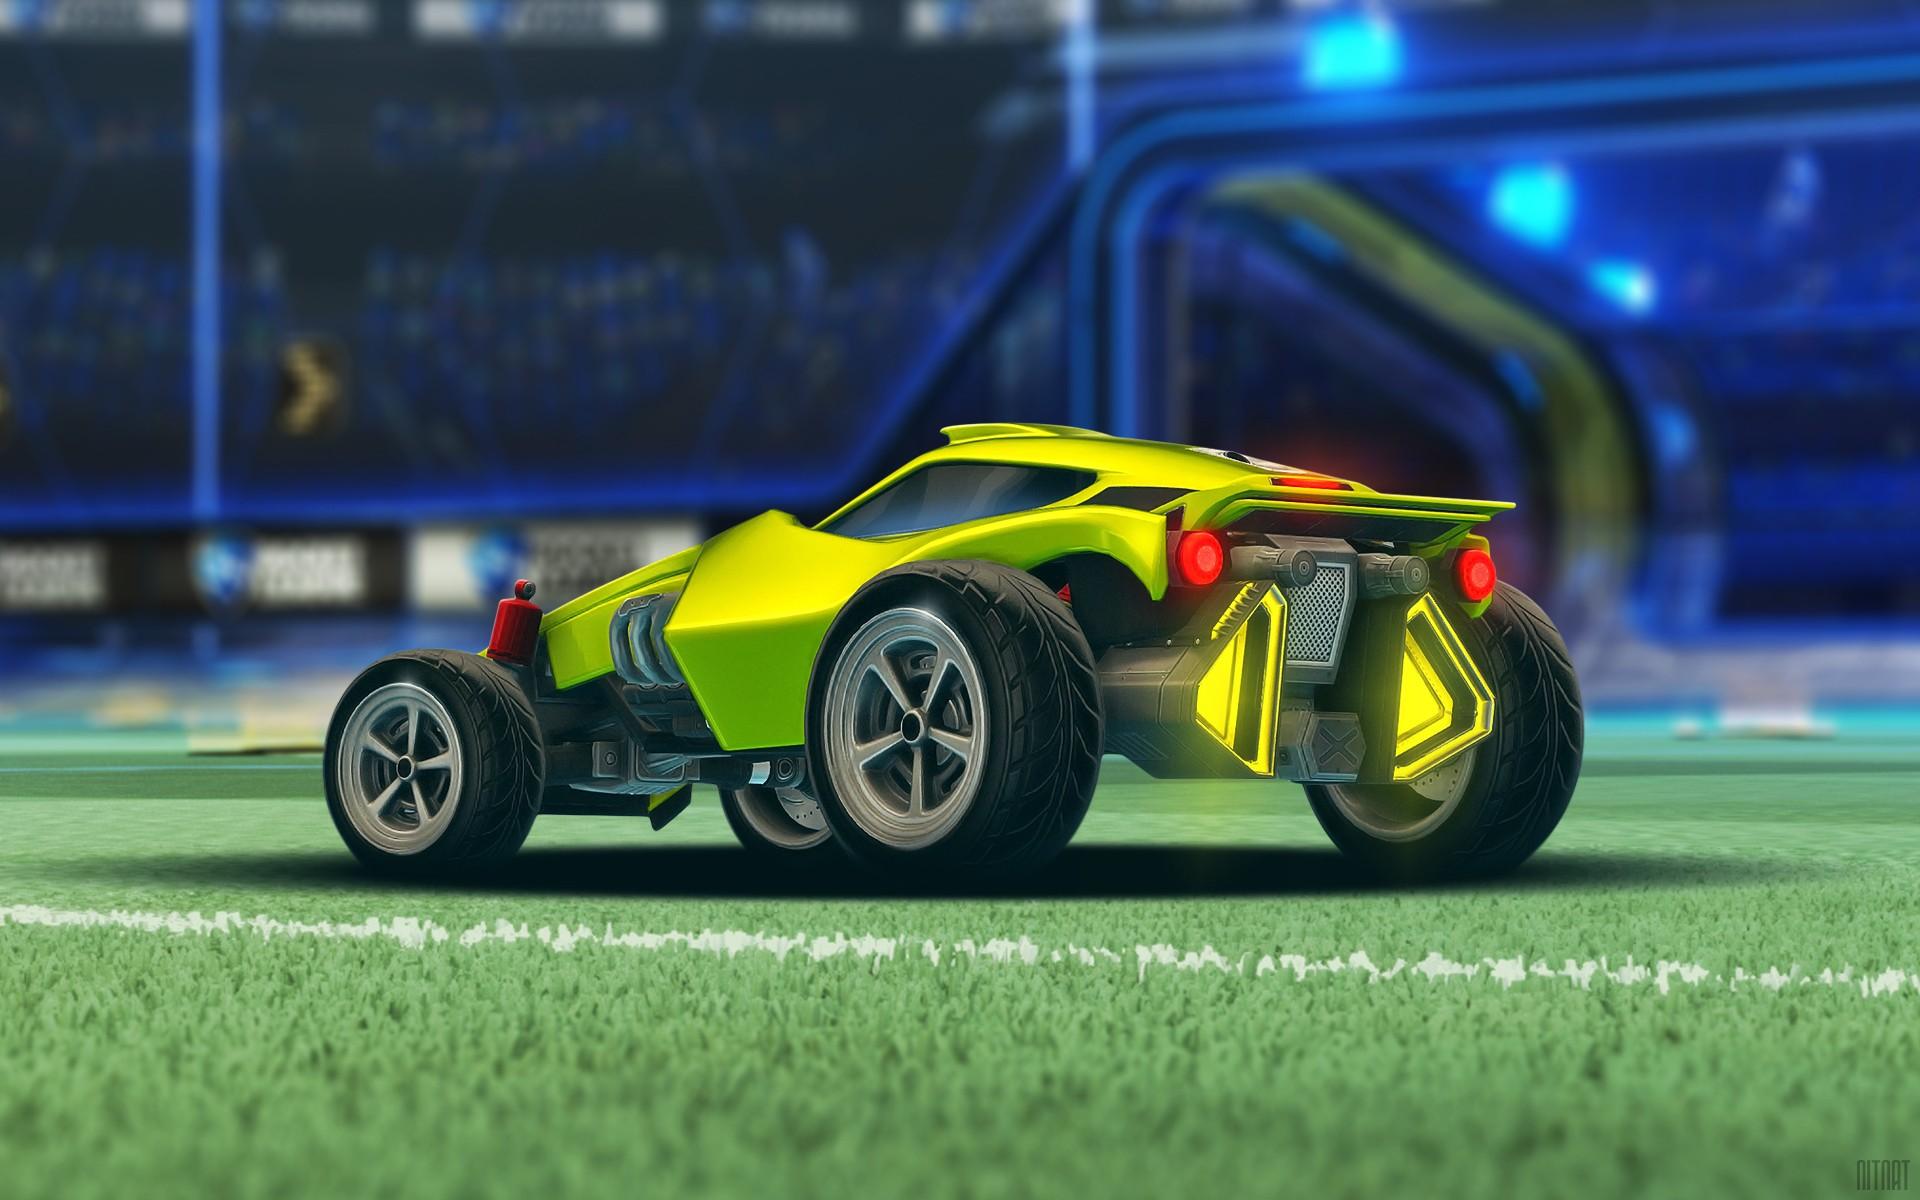 Wallpaper : video games, render, yellow, sports car, Rocket League ...